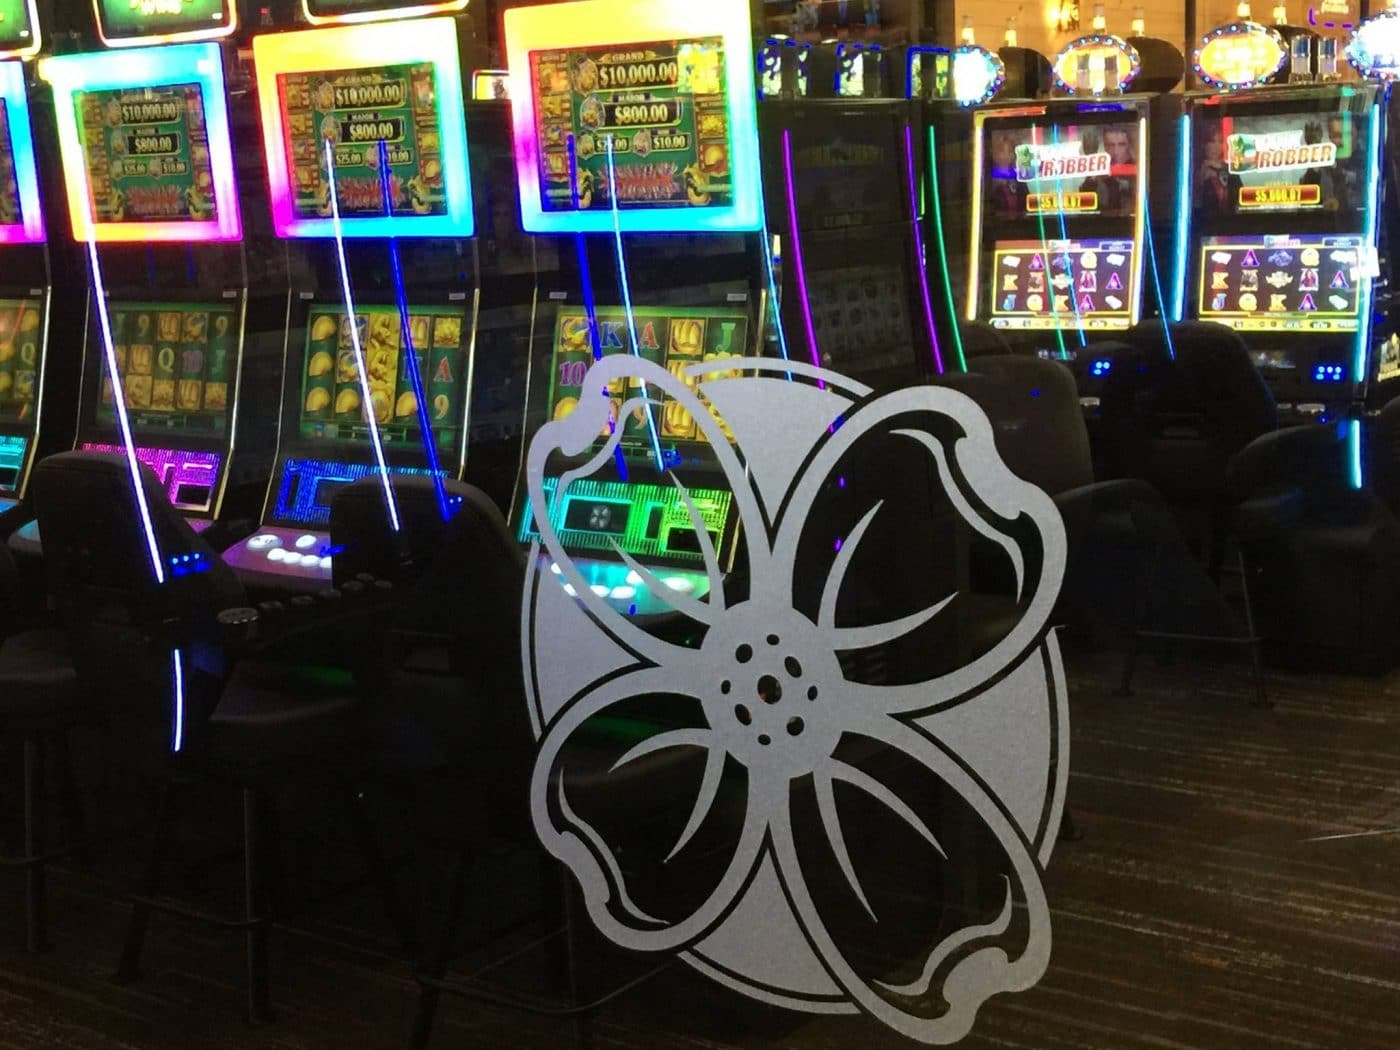 Gossip casino mobile